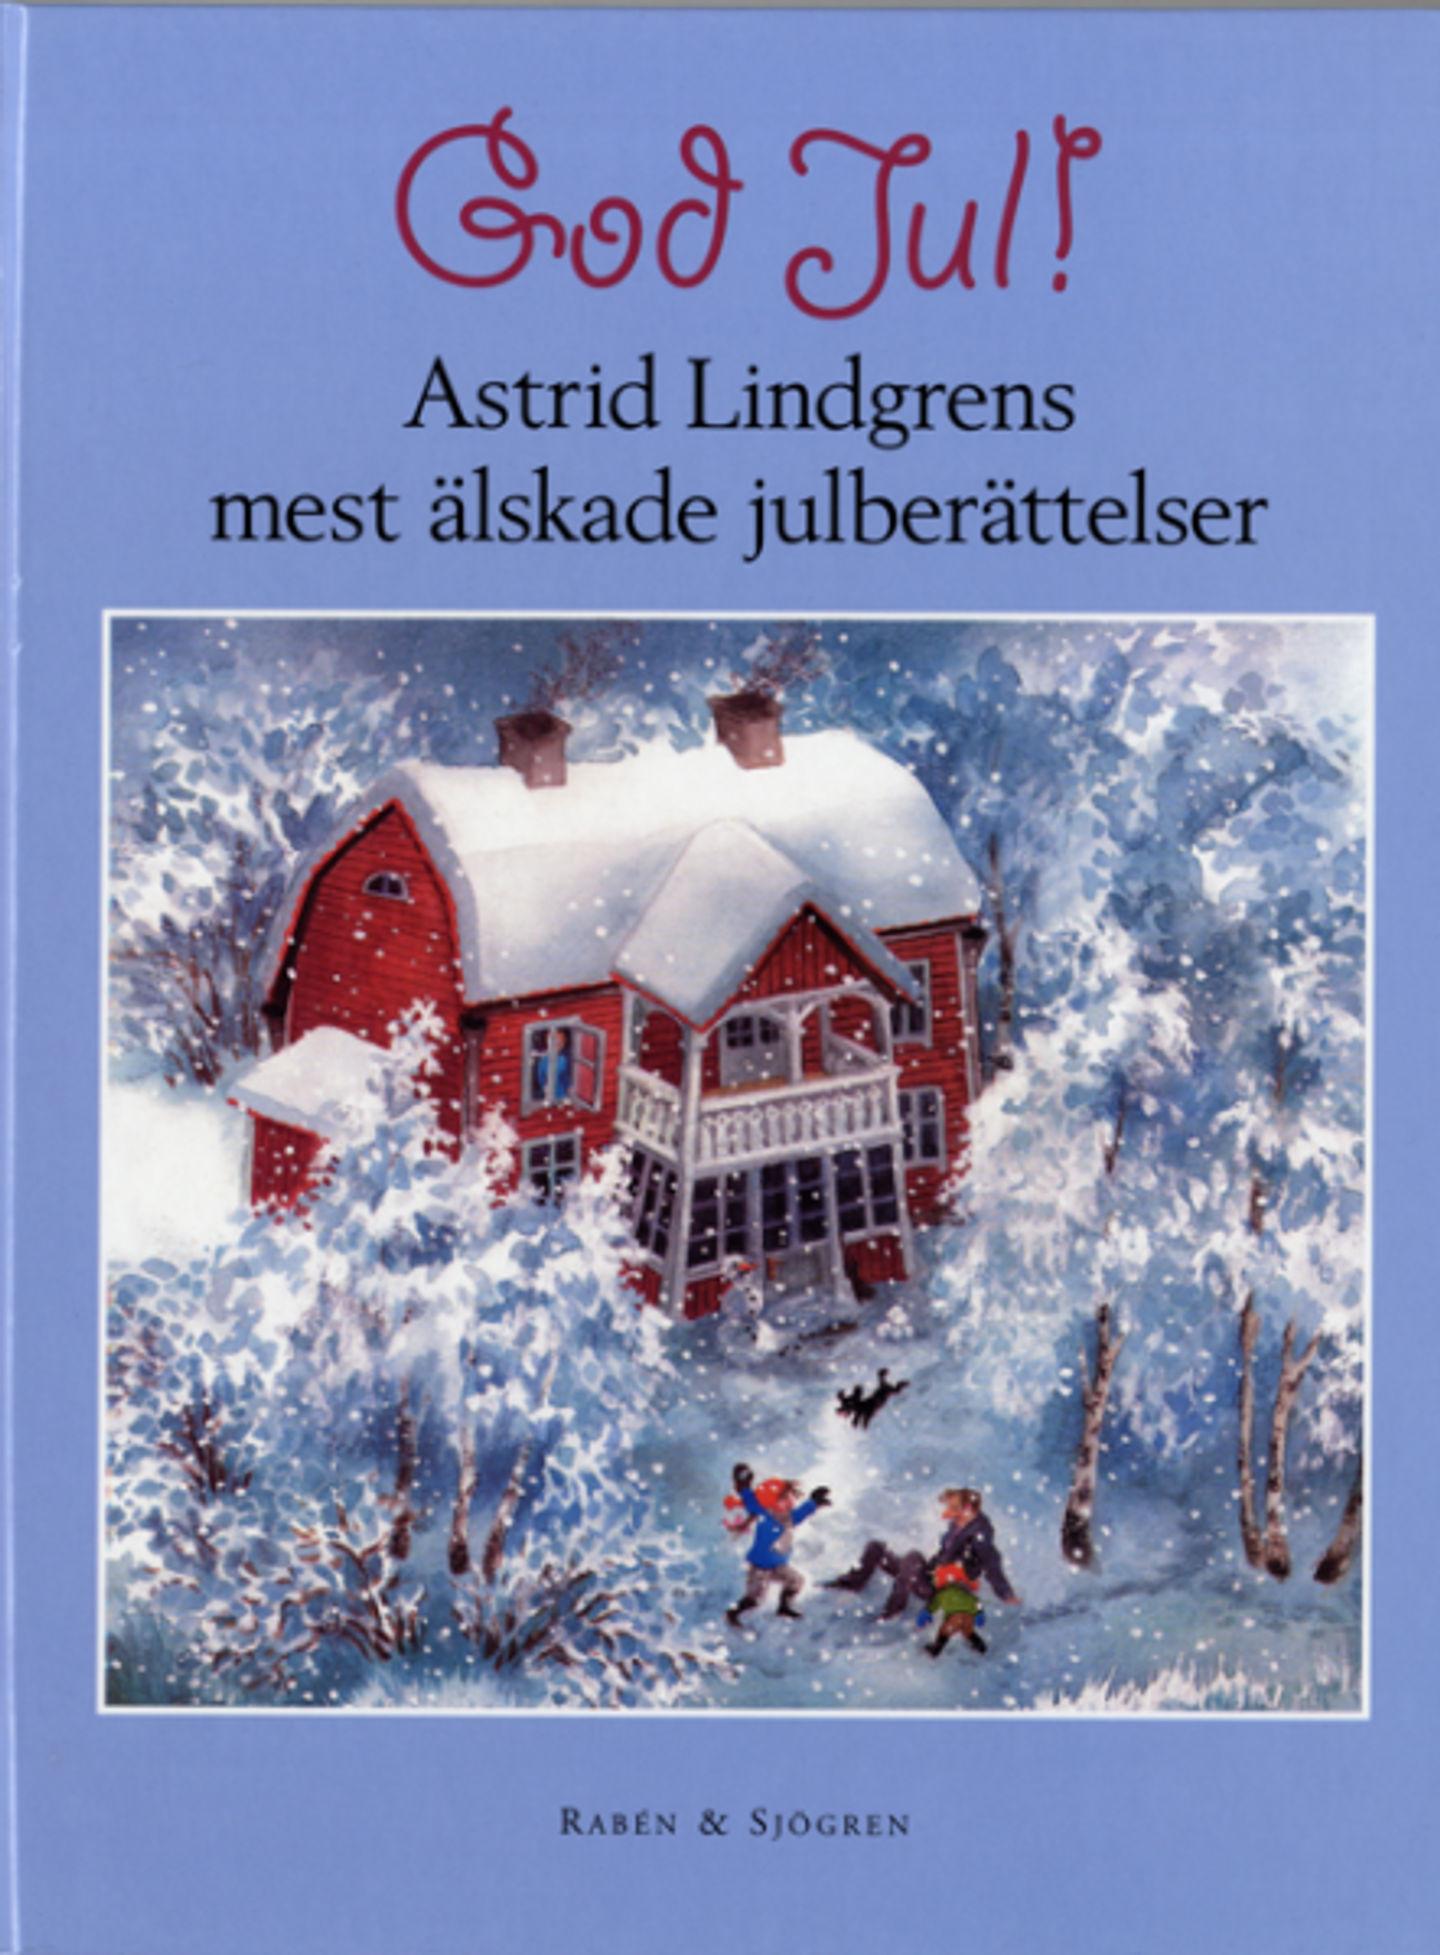 astrid lindgren julberättelser